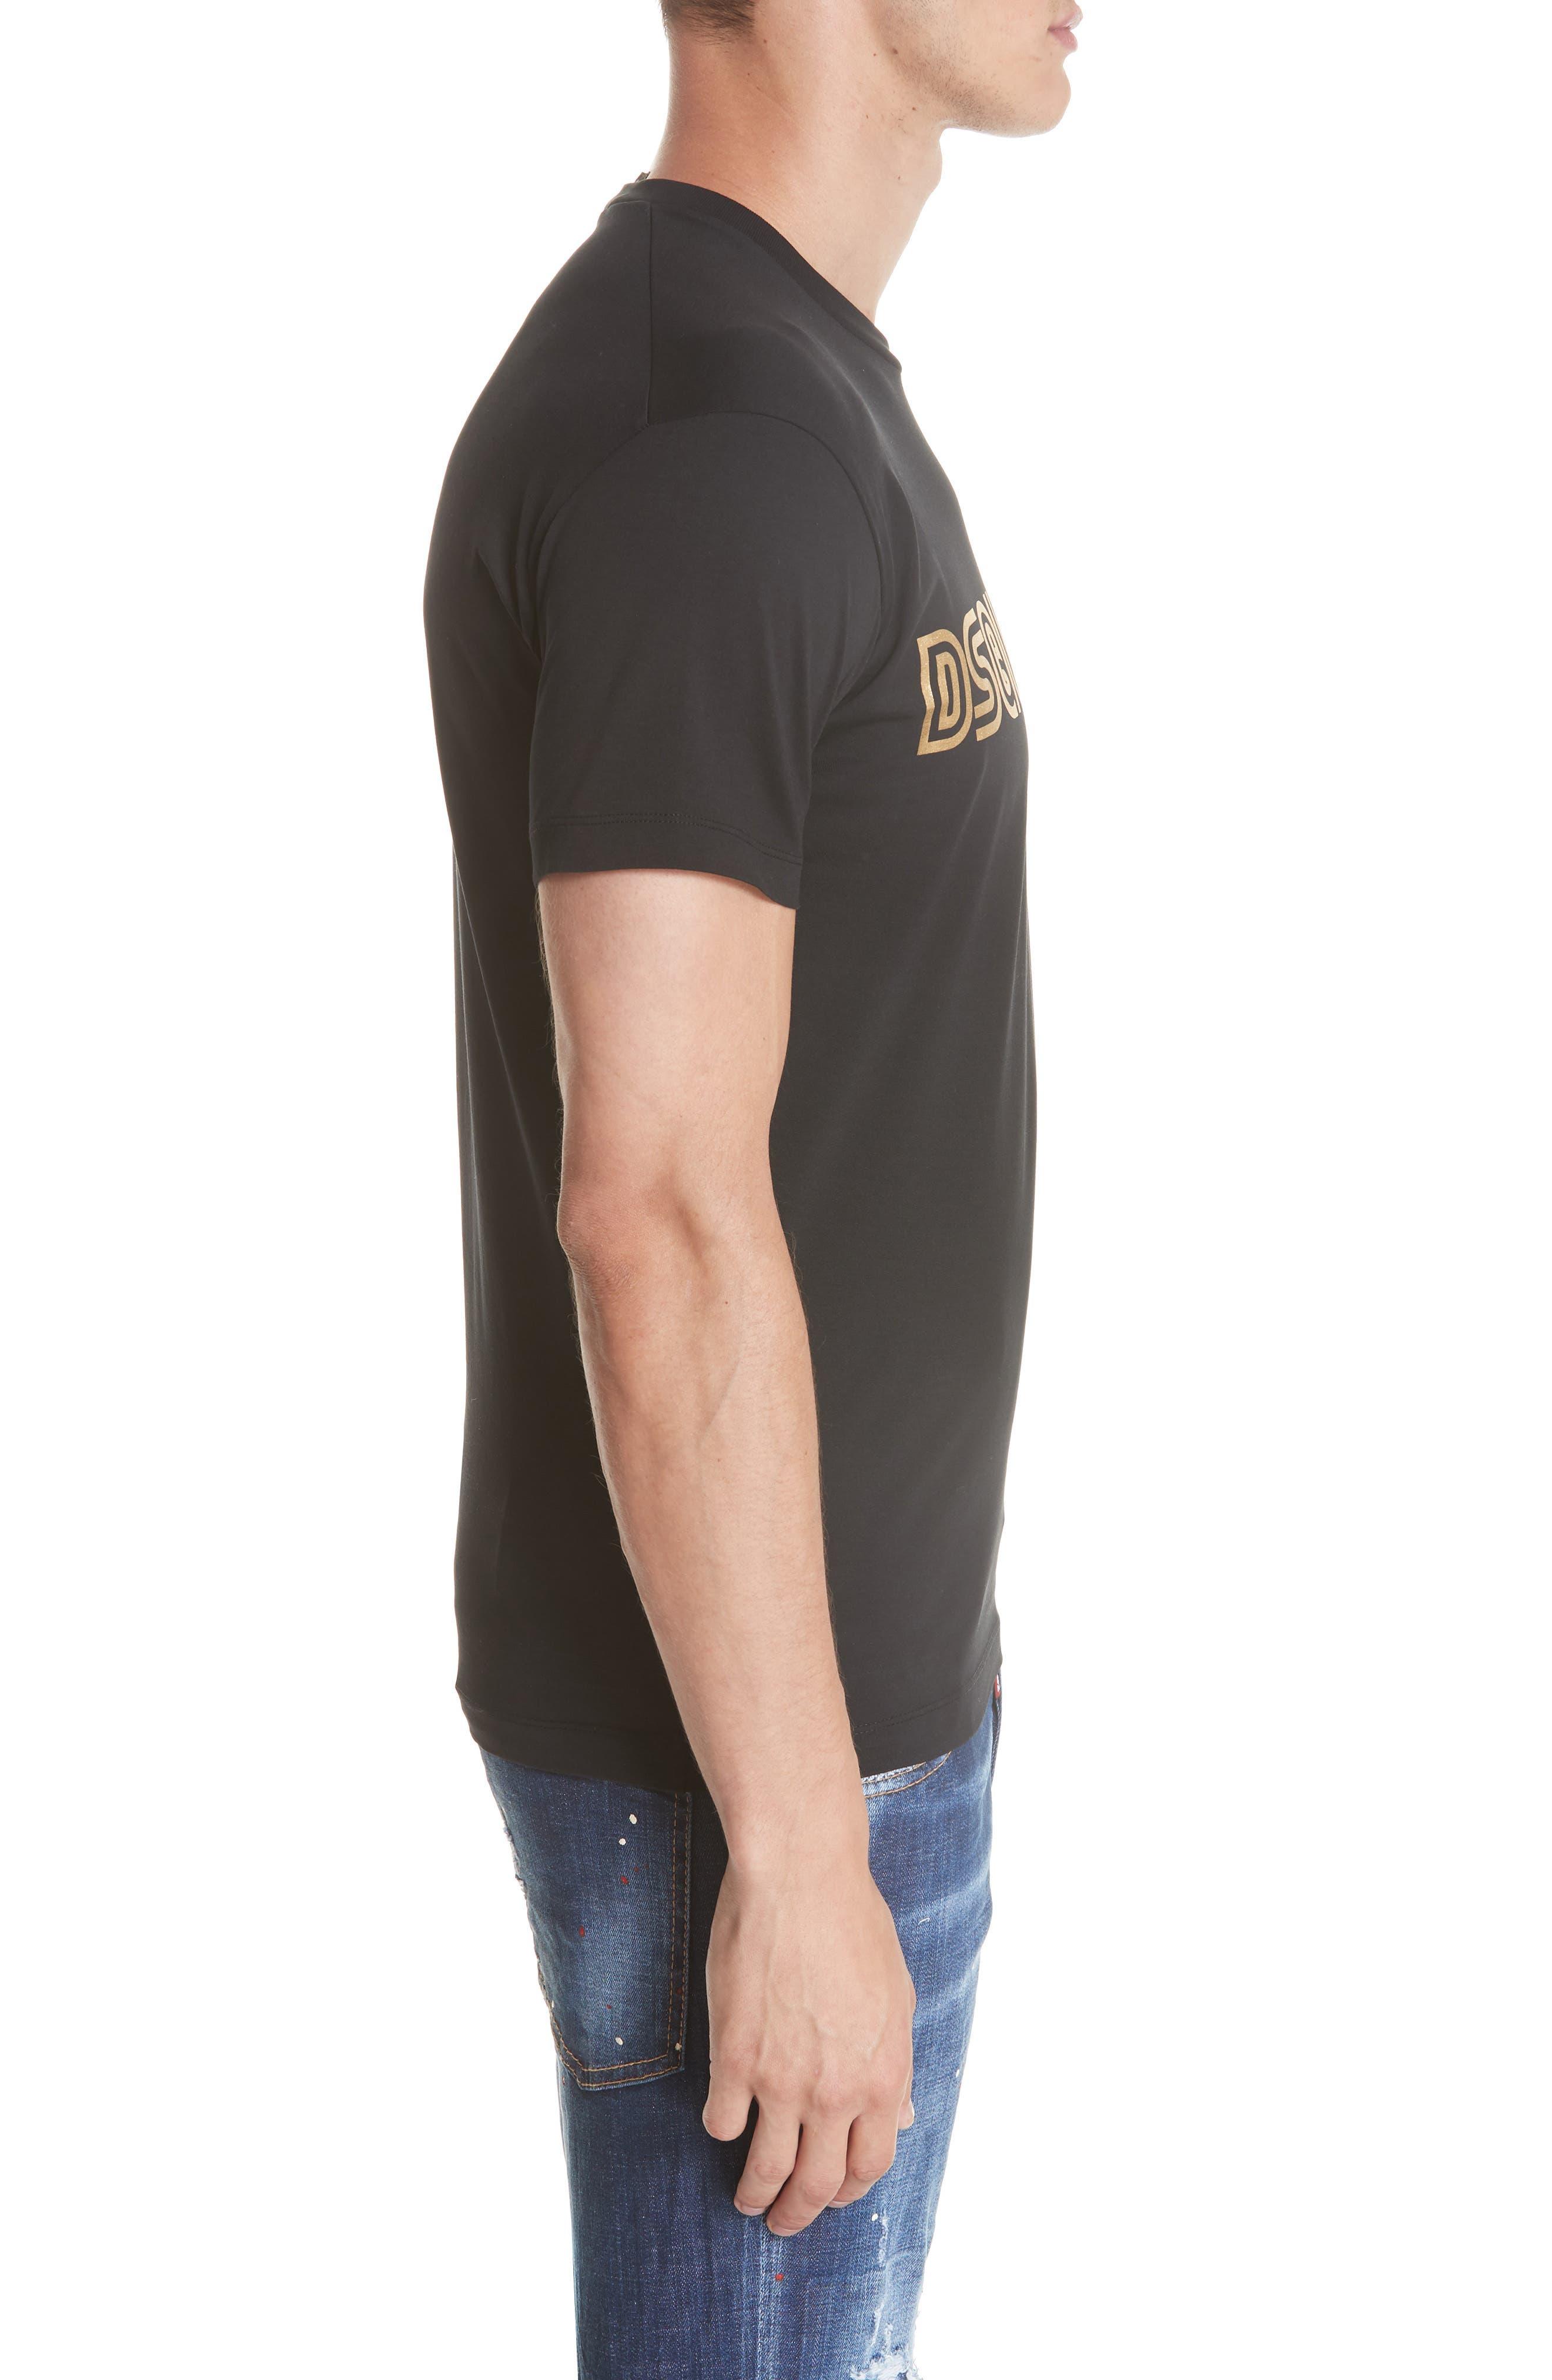 Studio 54 Graphic T-Shirt,                             Alternate thumbnail 3, color,                             001